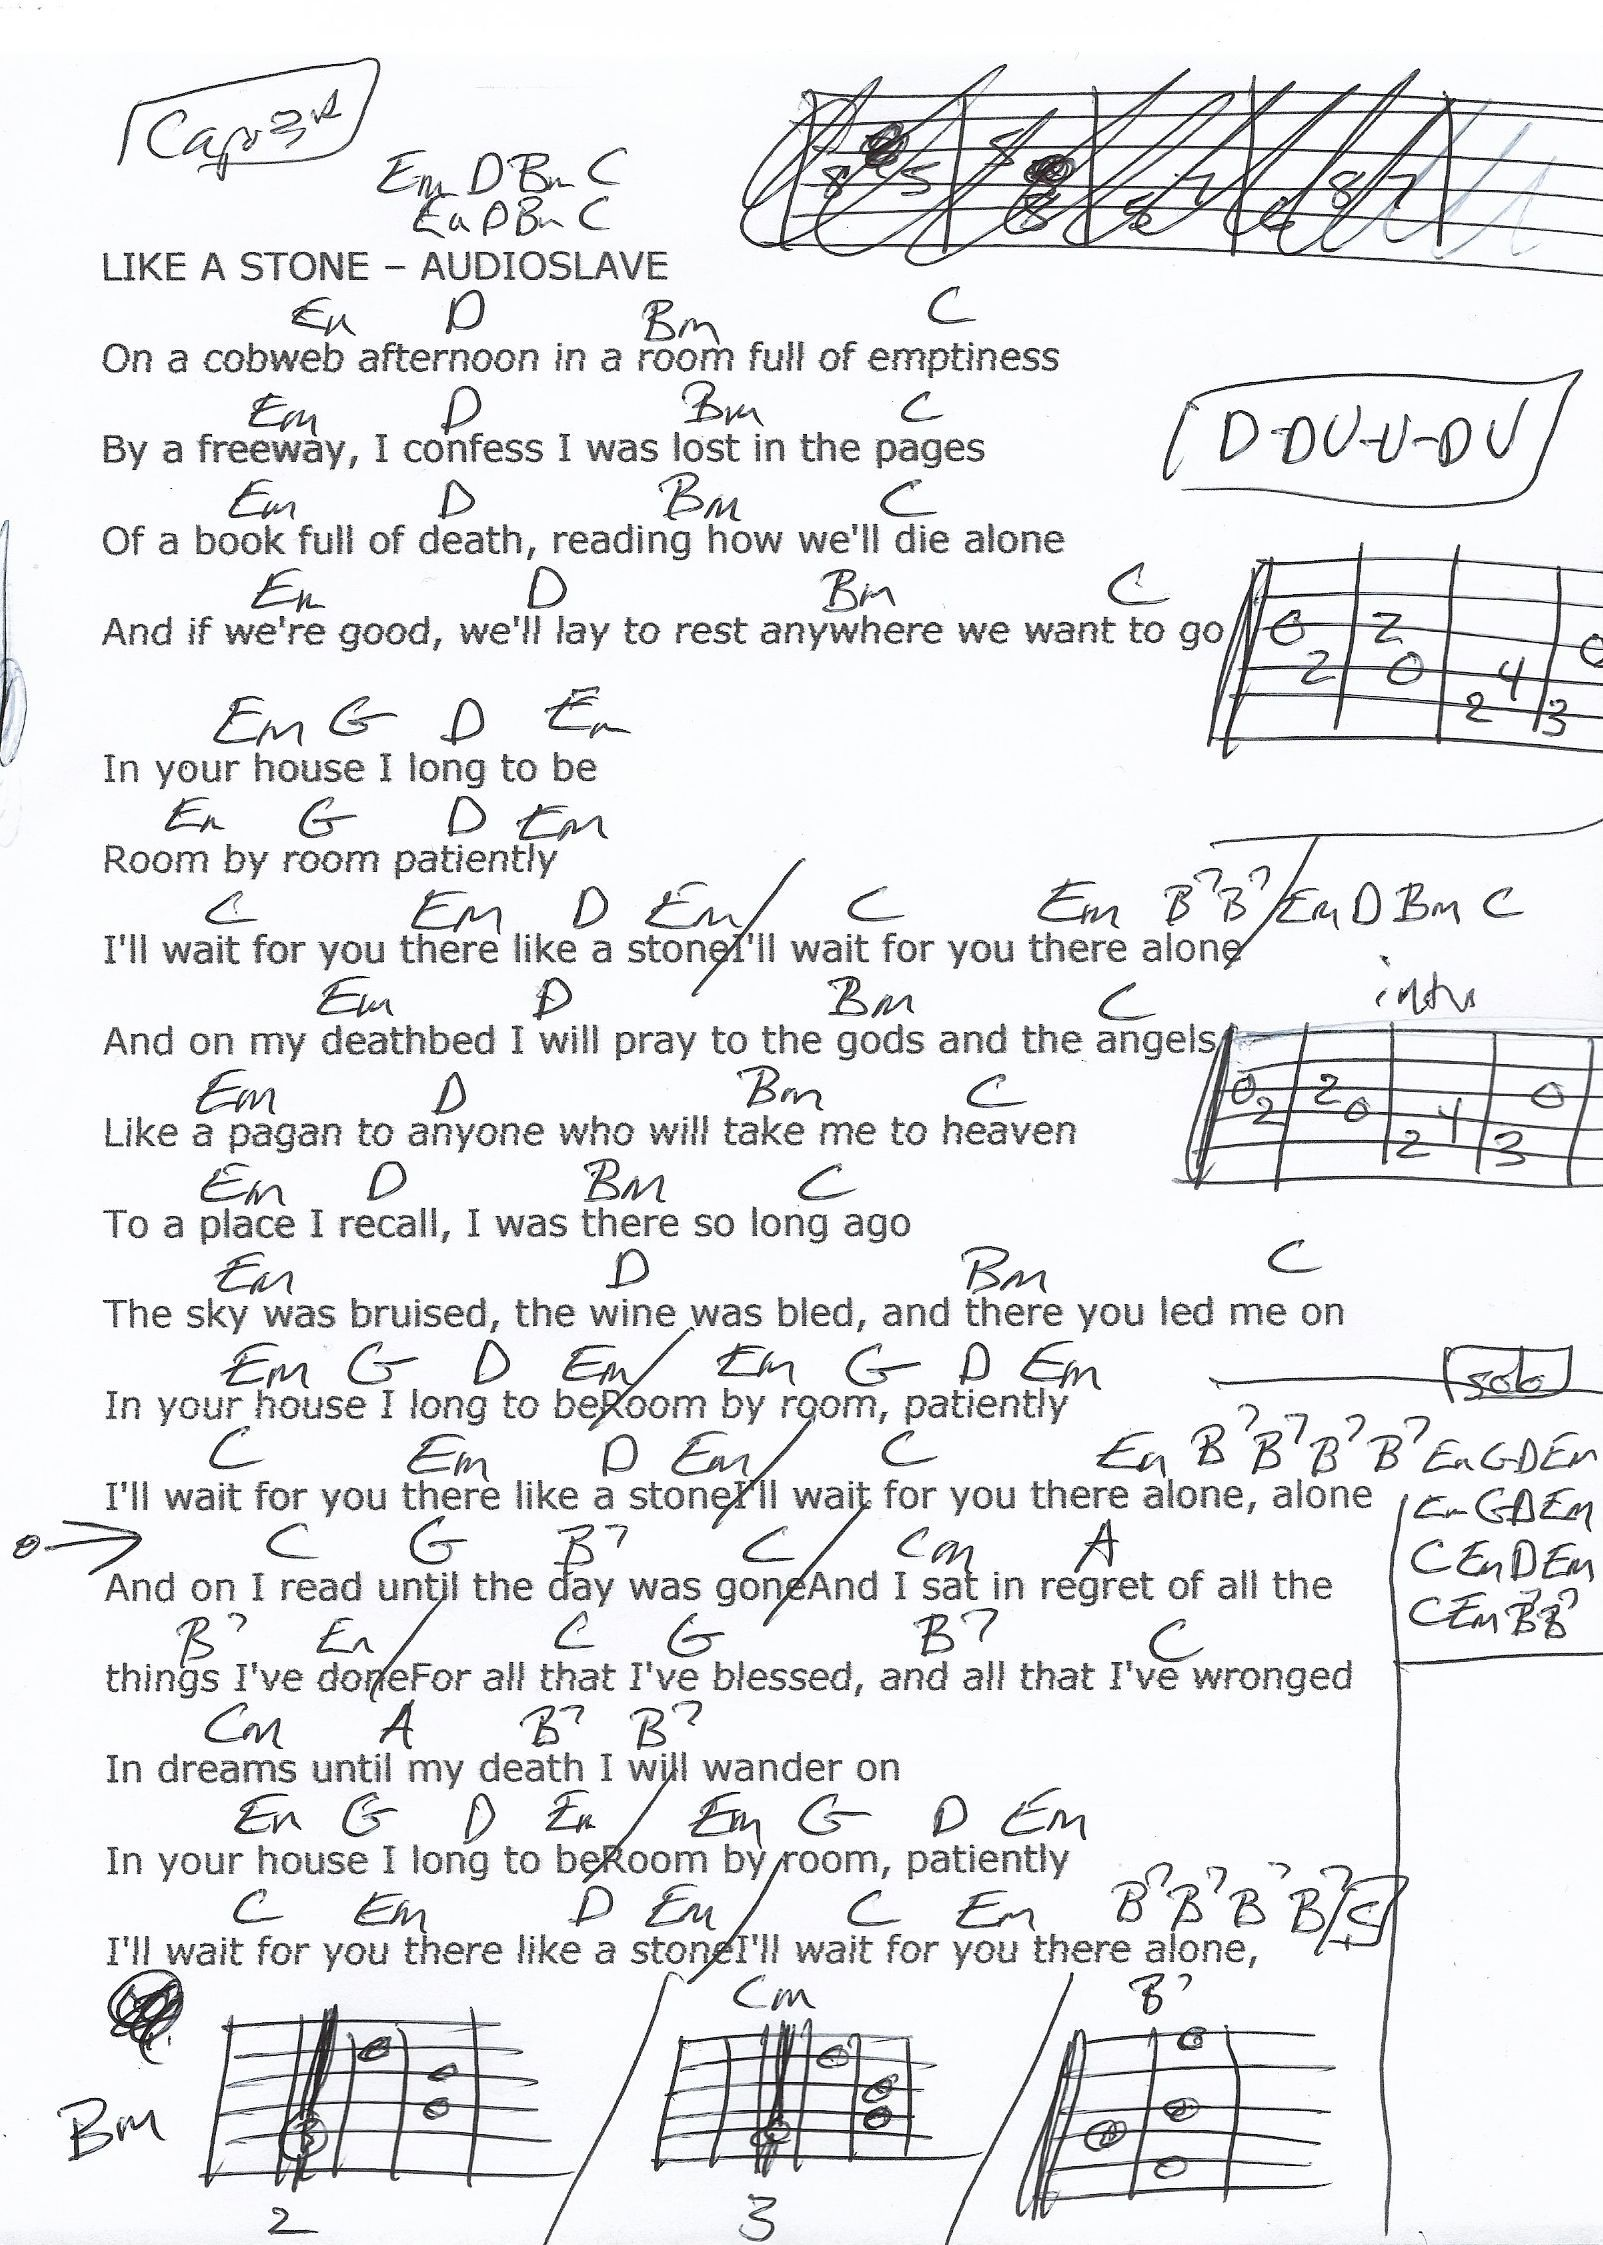 Audioslave Like A Stone Chord : audioslave, stone, chord, Stone, (Audioslave), Guitar, Chord, Chart, Chords,, Chart,, Songs